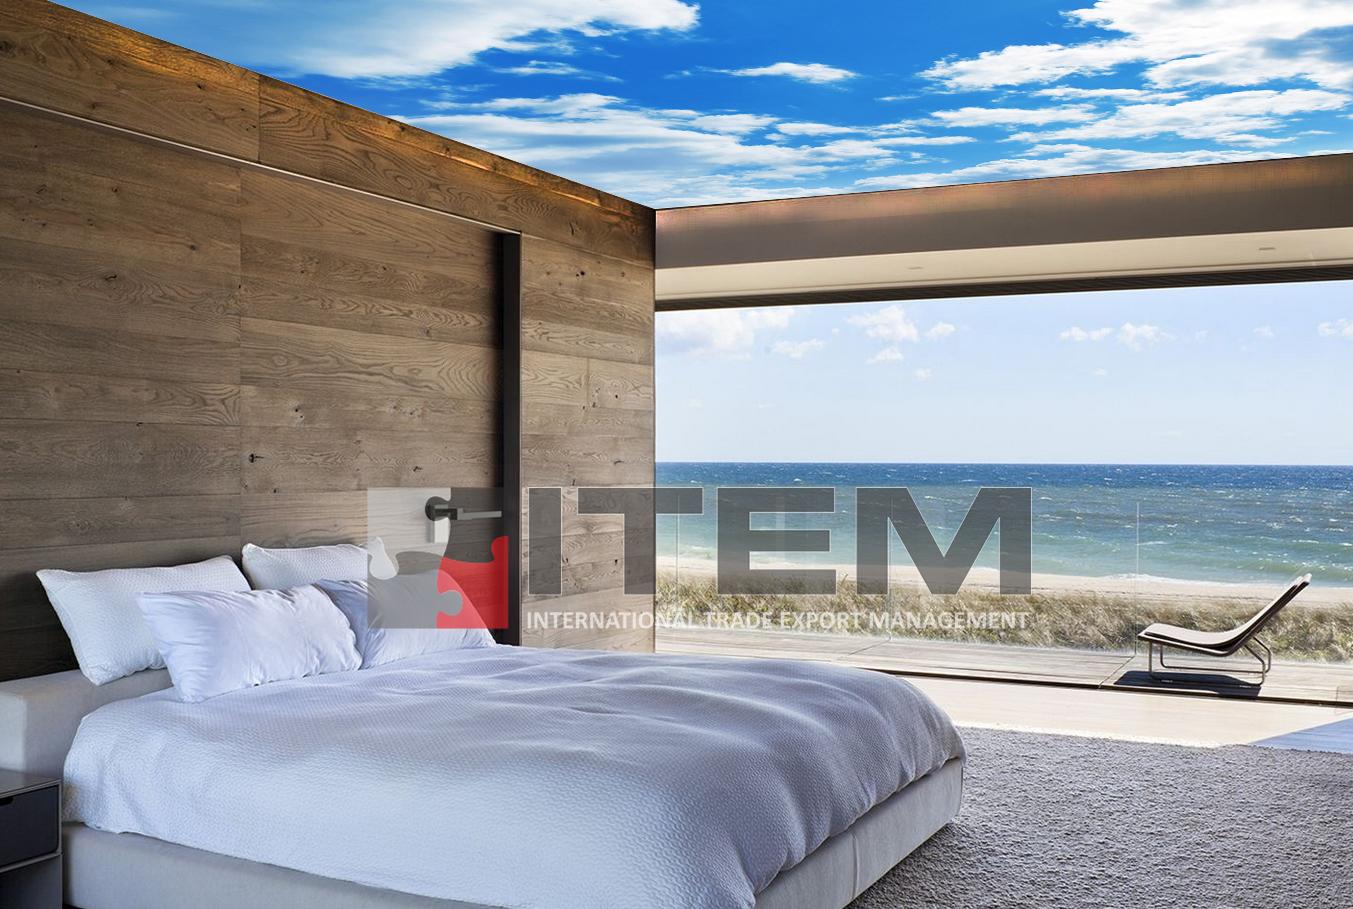 Related pictures gergi tavan barrisol barisol modelleri pictures to -  Yatak Odas G Ky Z Gergi Tavan